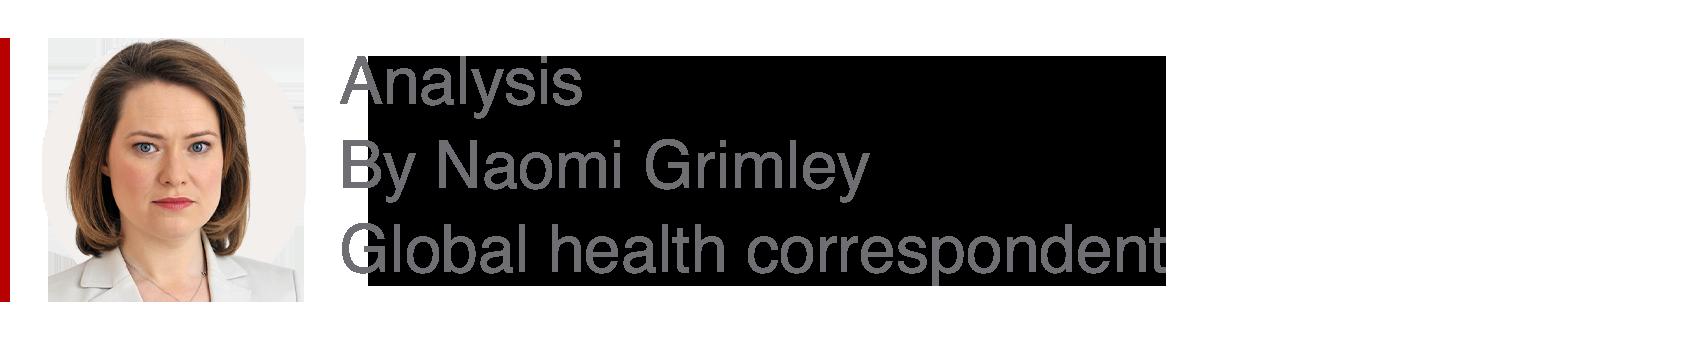 Analysis box by Naomi Grimley, Global health correspondent